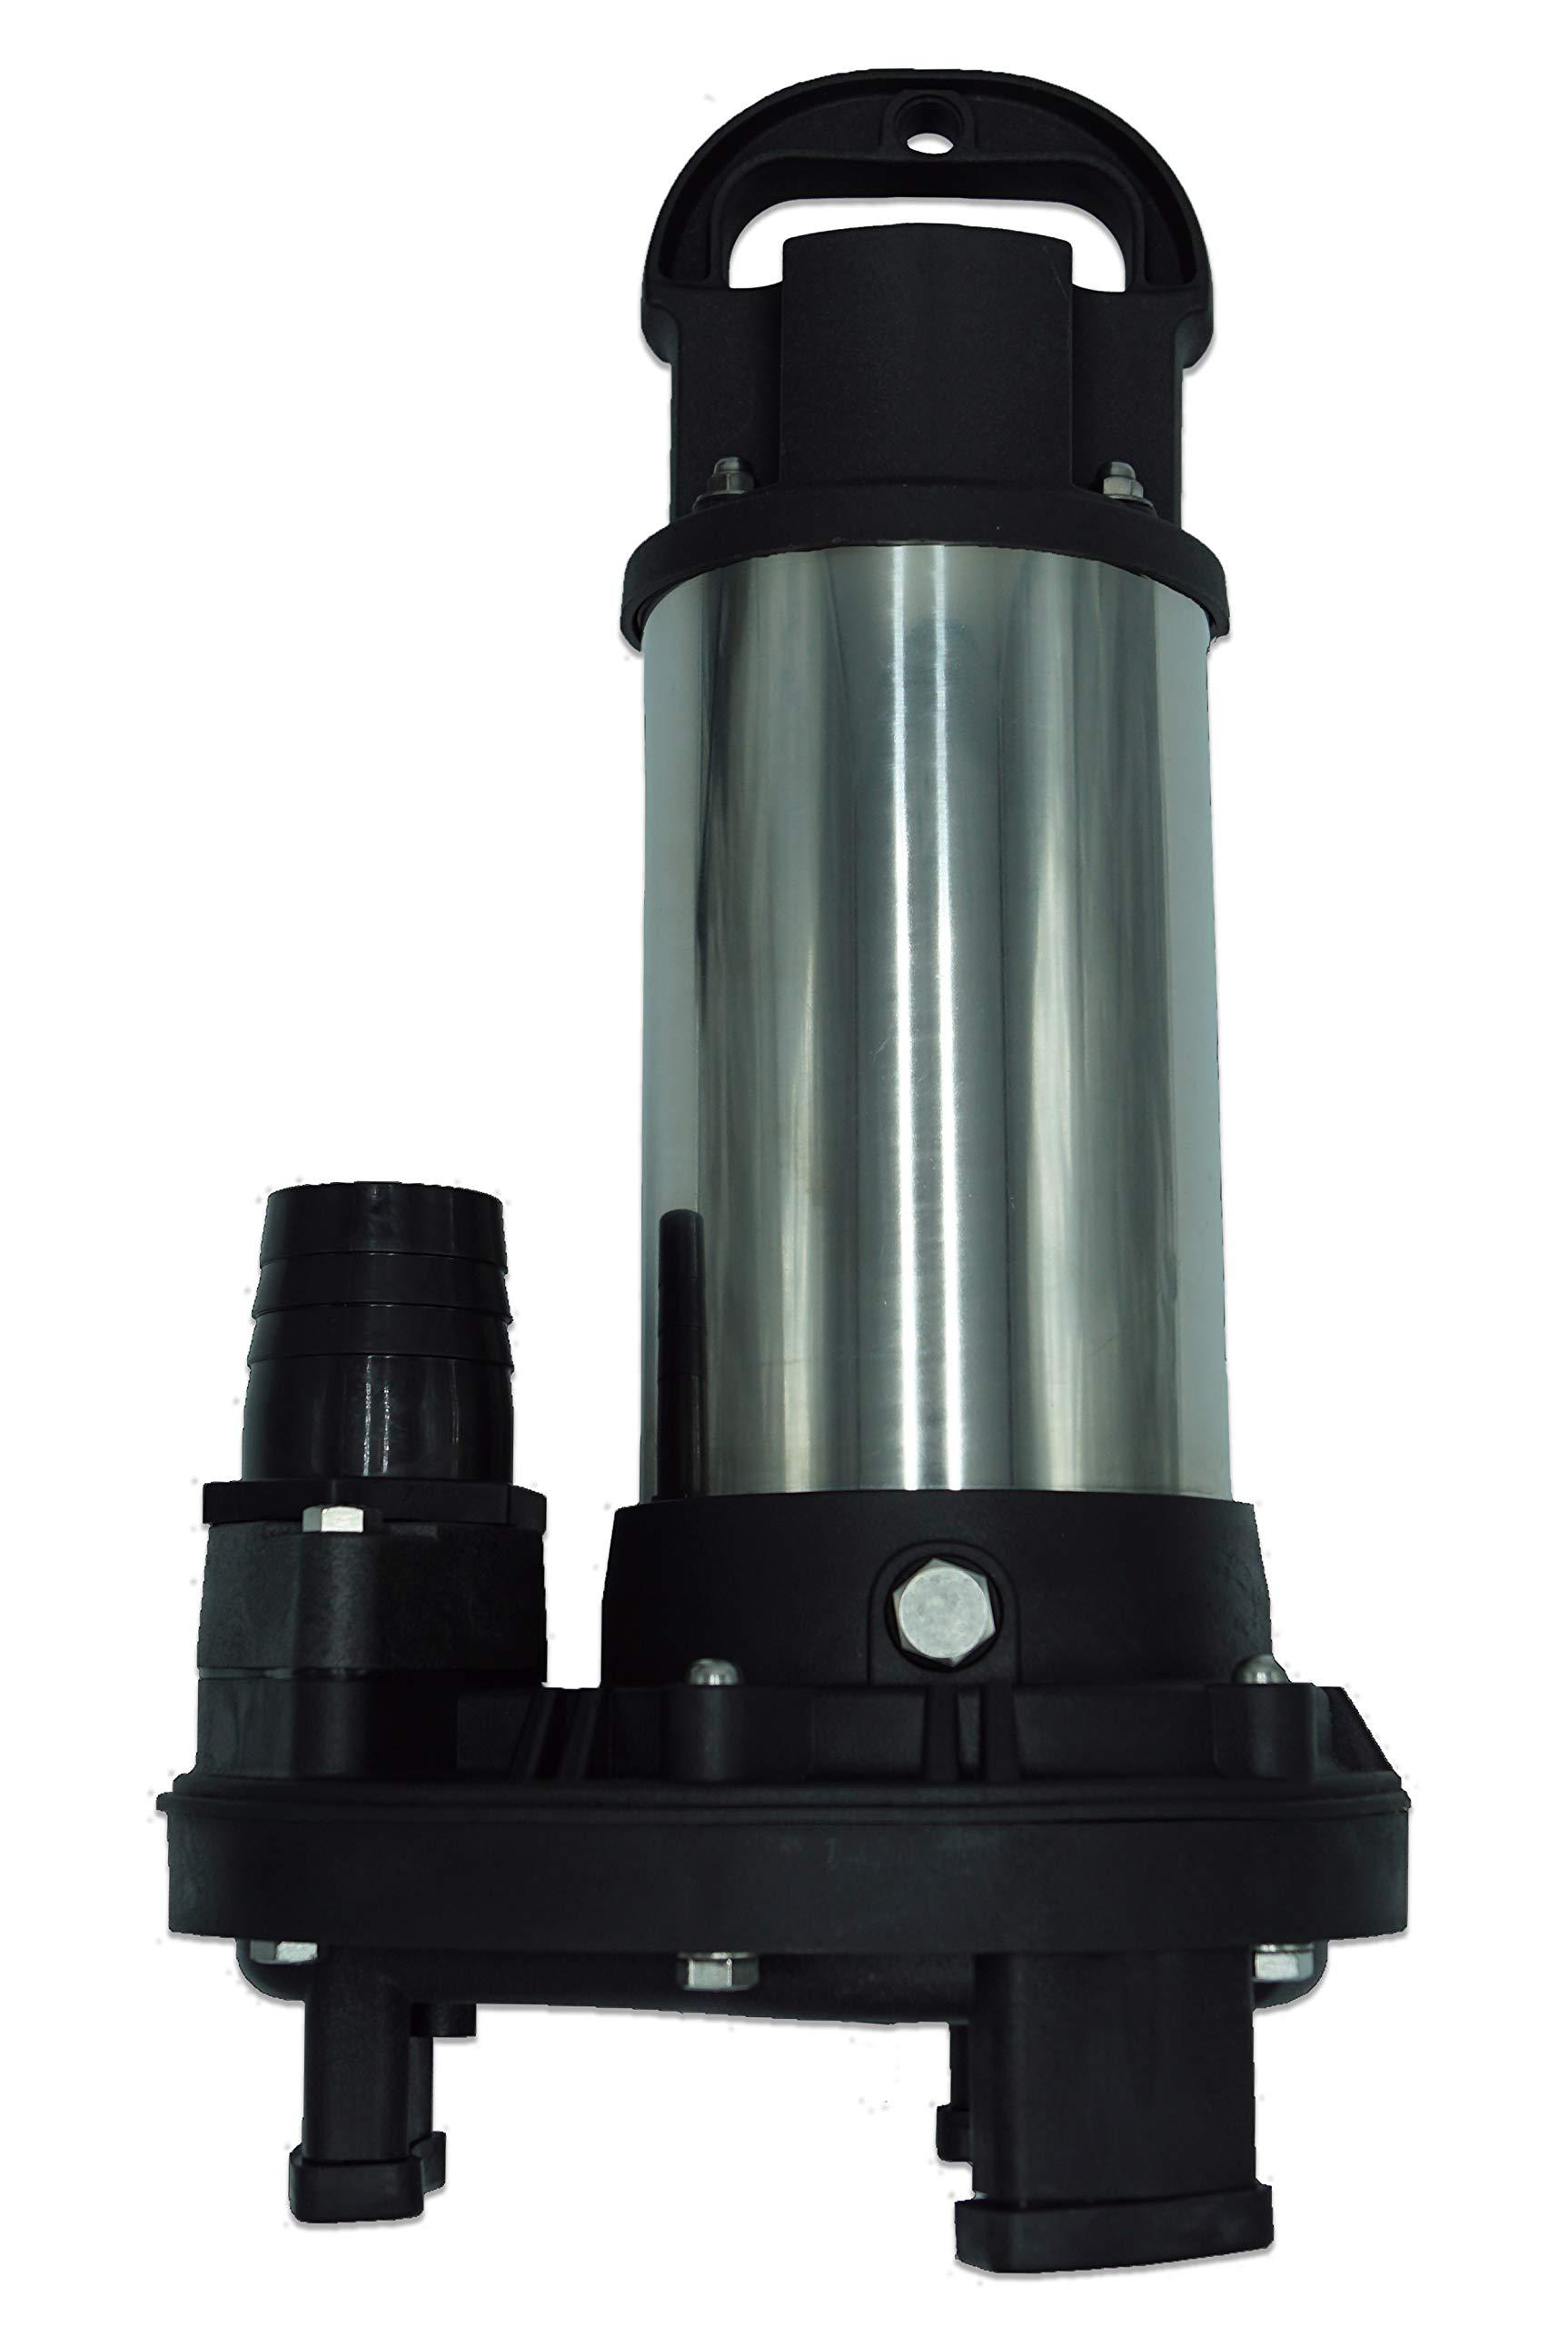 Piranha 4,200 GPH Direct Drive Submersible Pump - Up To 4,200 GPH Max Flow